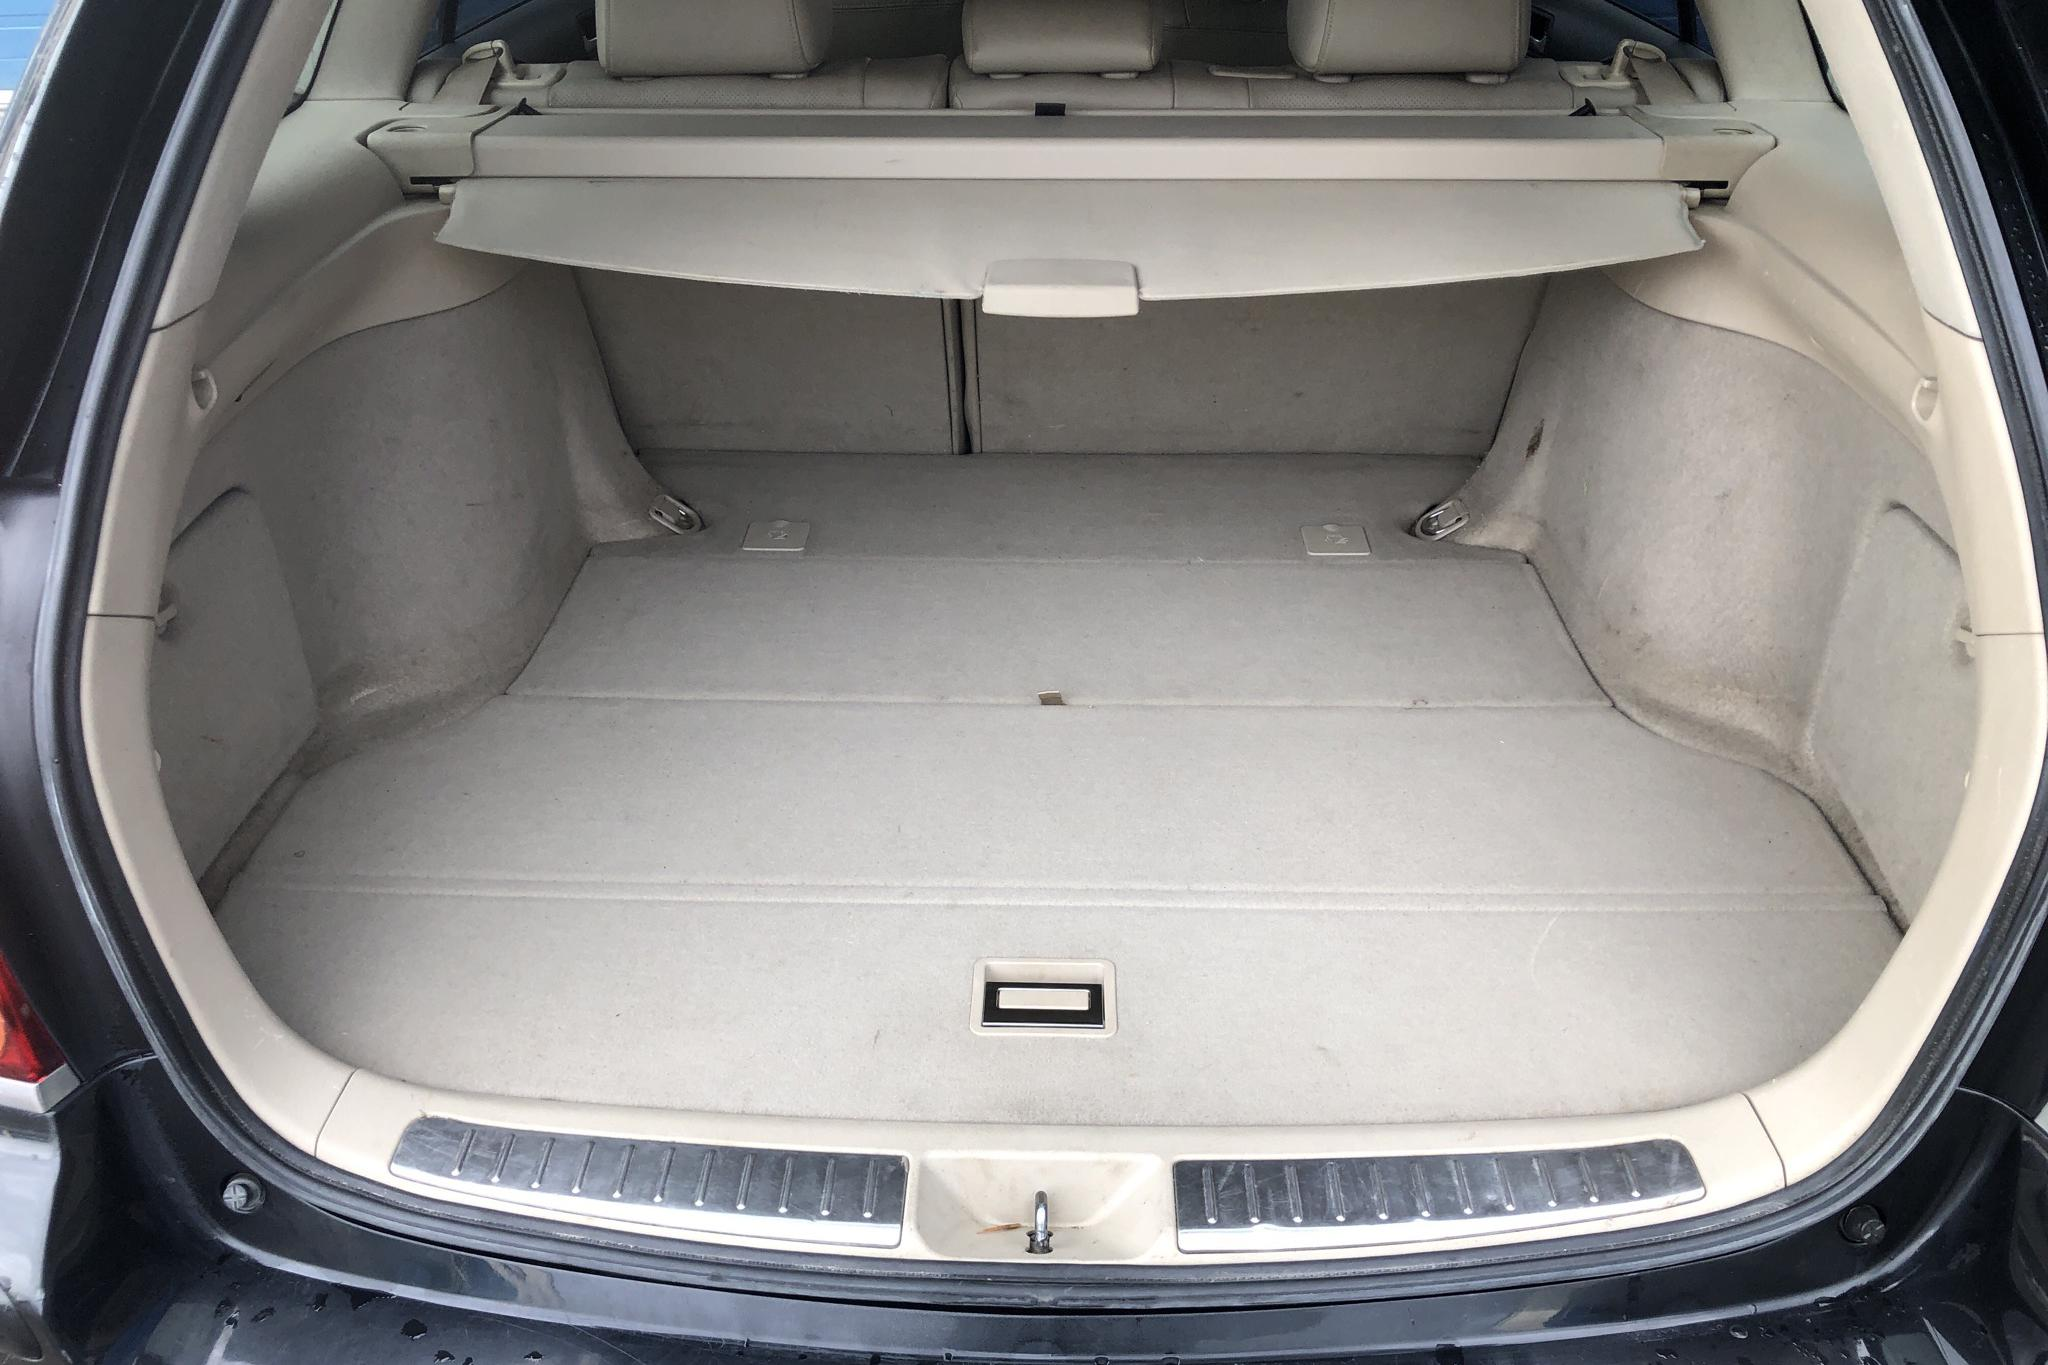 Toyota Avensis 2.4 Kombi (163hk) - 224 740 km - Automatic - black - 2005